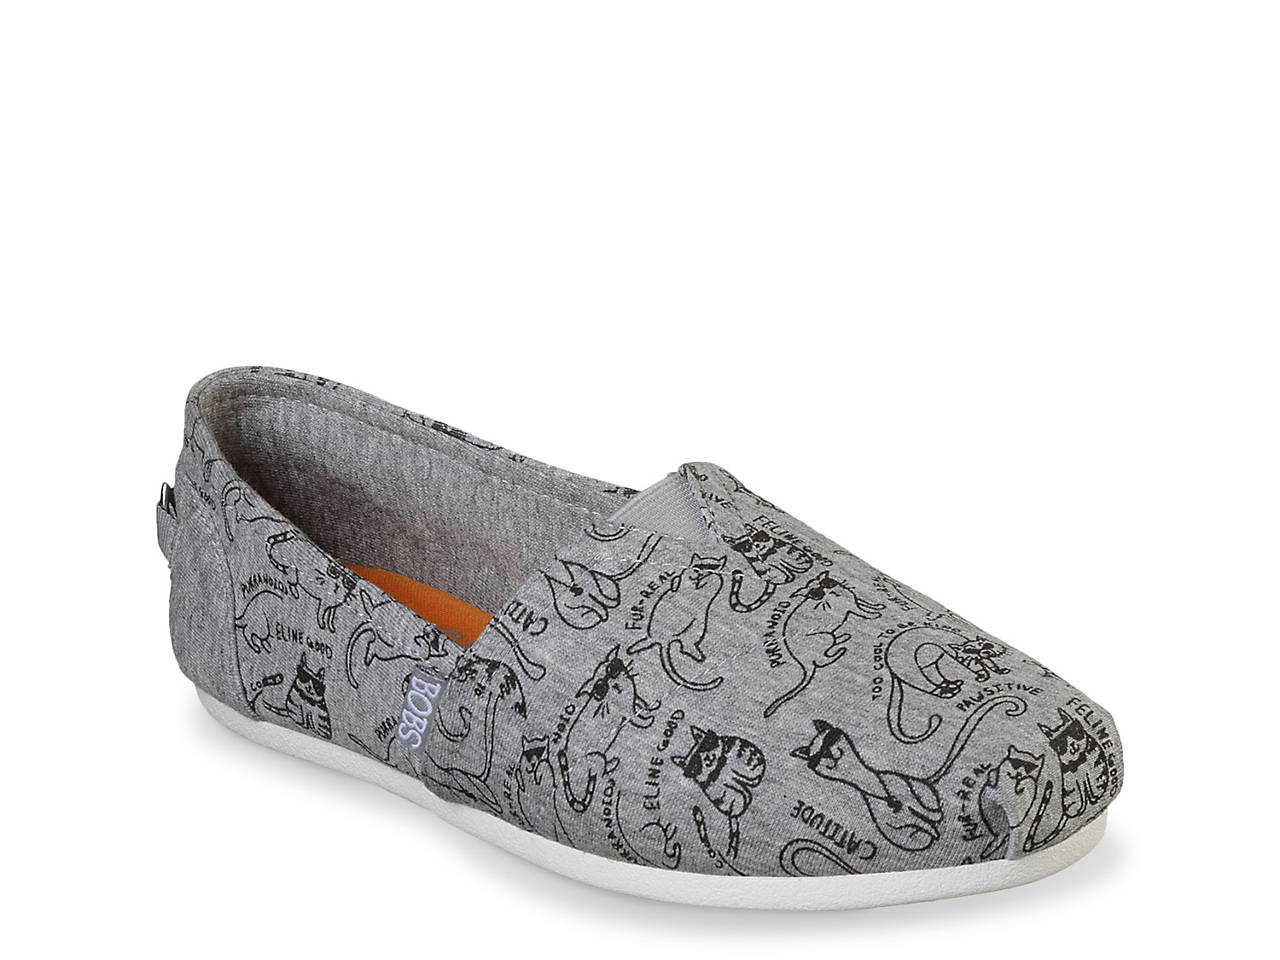 26779ae2f2c8 Skechers BOBS Meow Moods Slip-On Women's Shoes | DSW